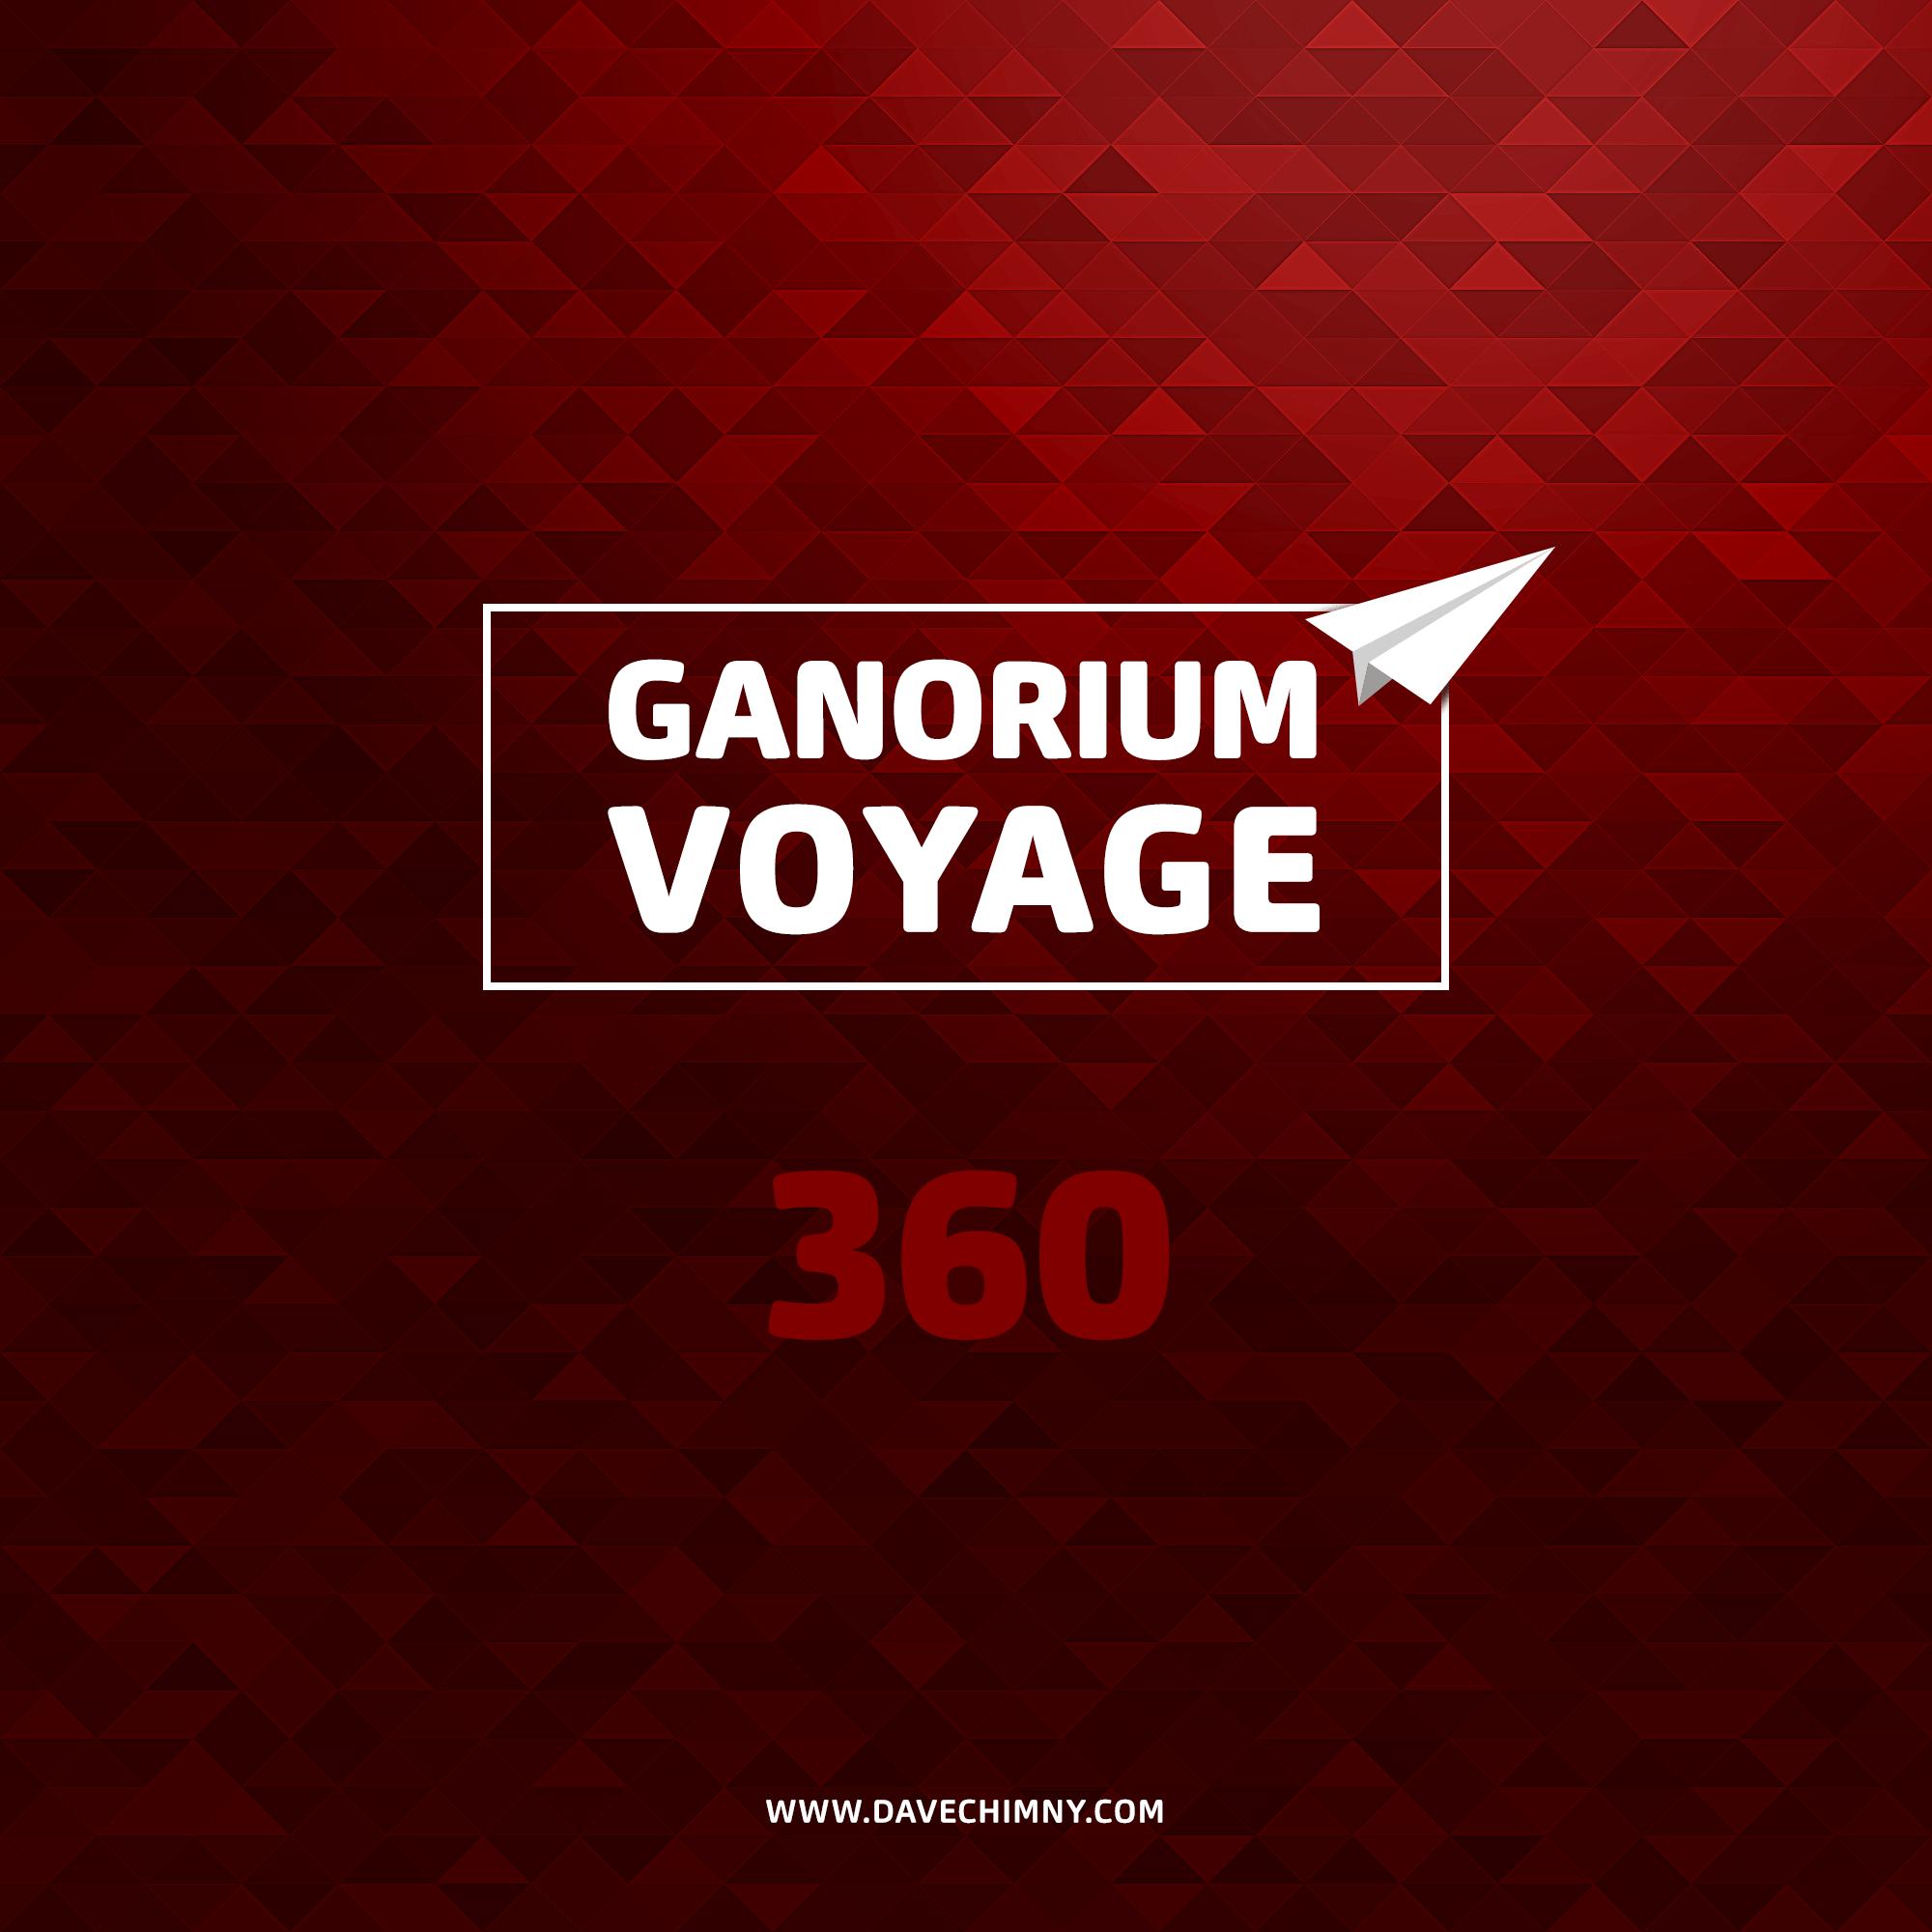 Dave Chimny – Ganorium Voyage 360